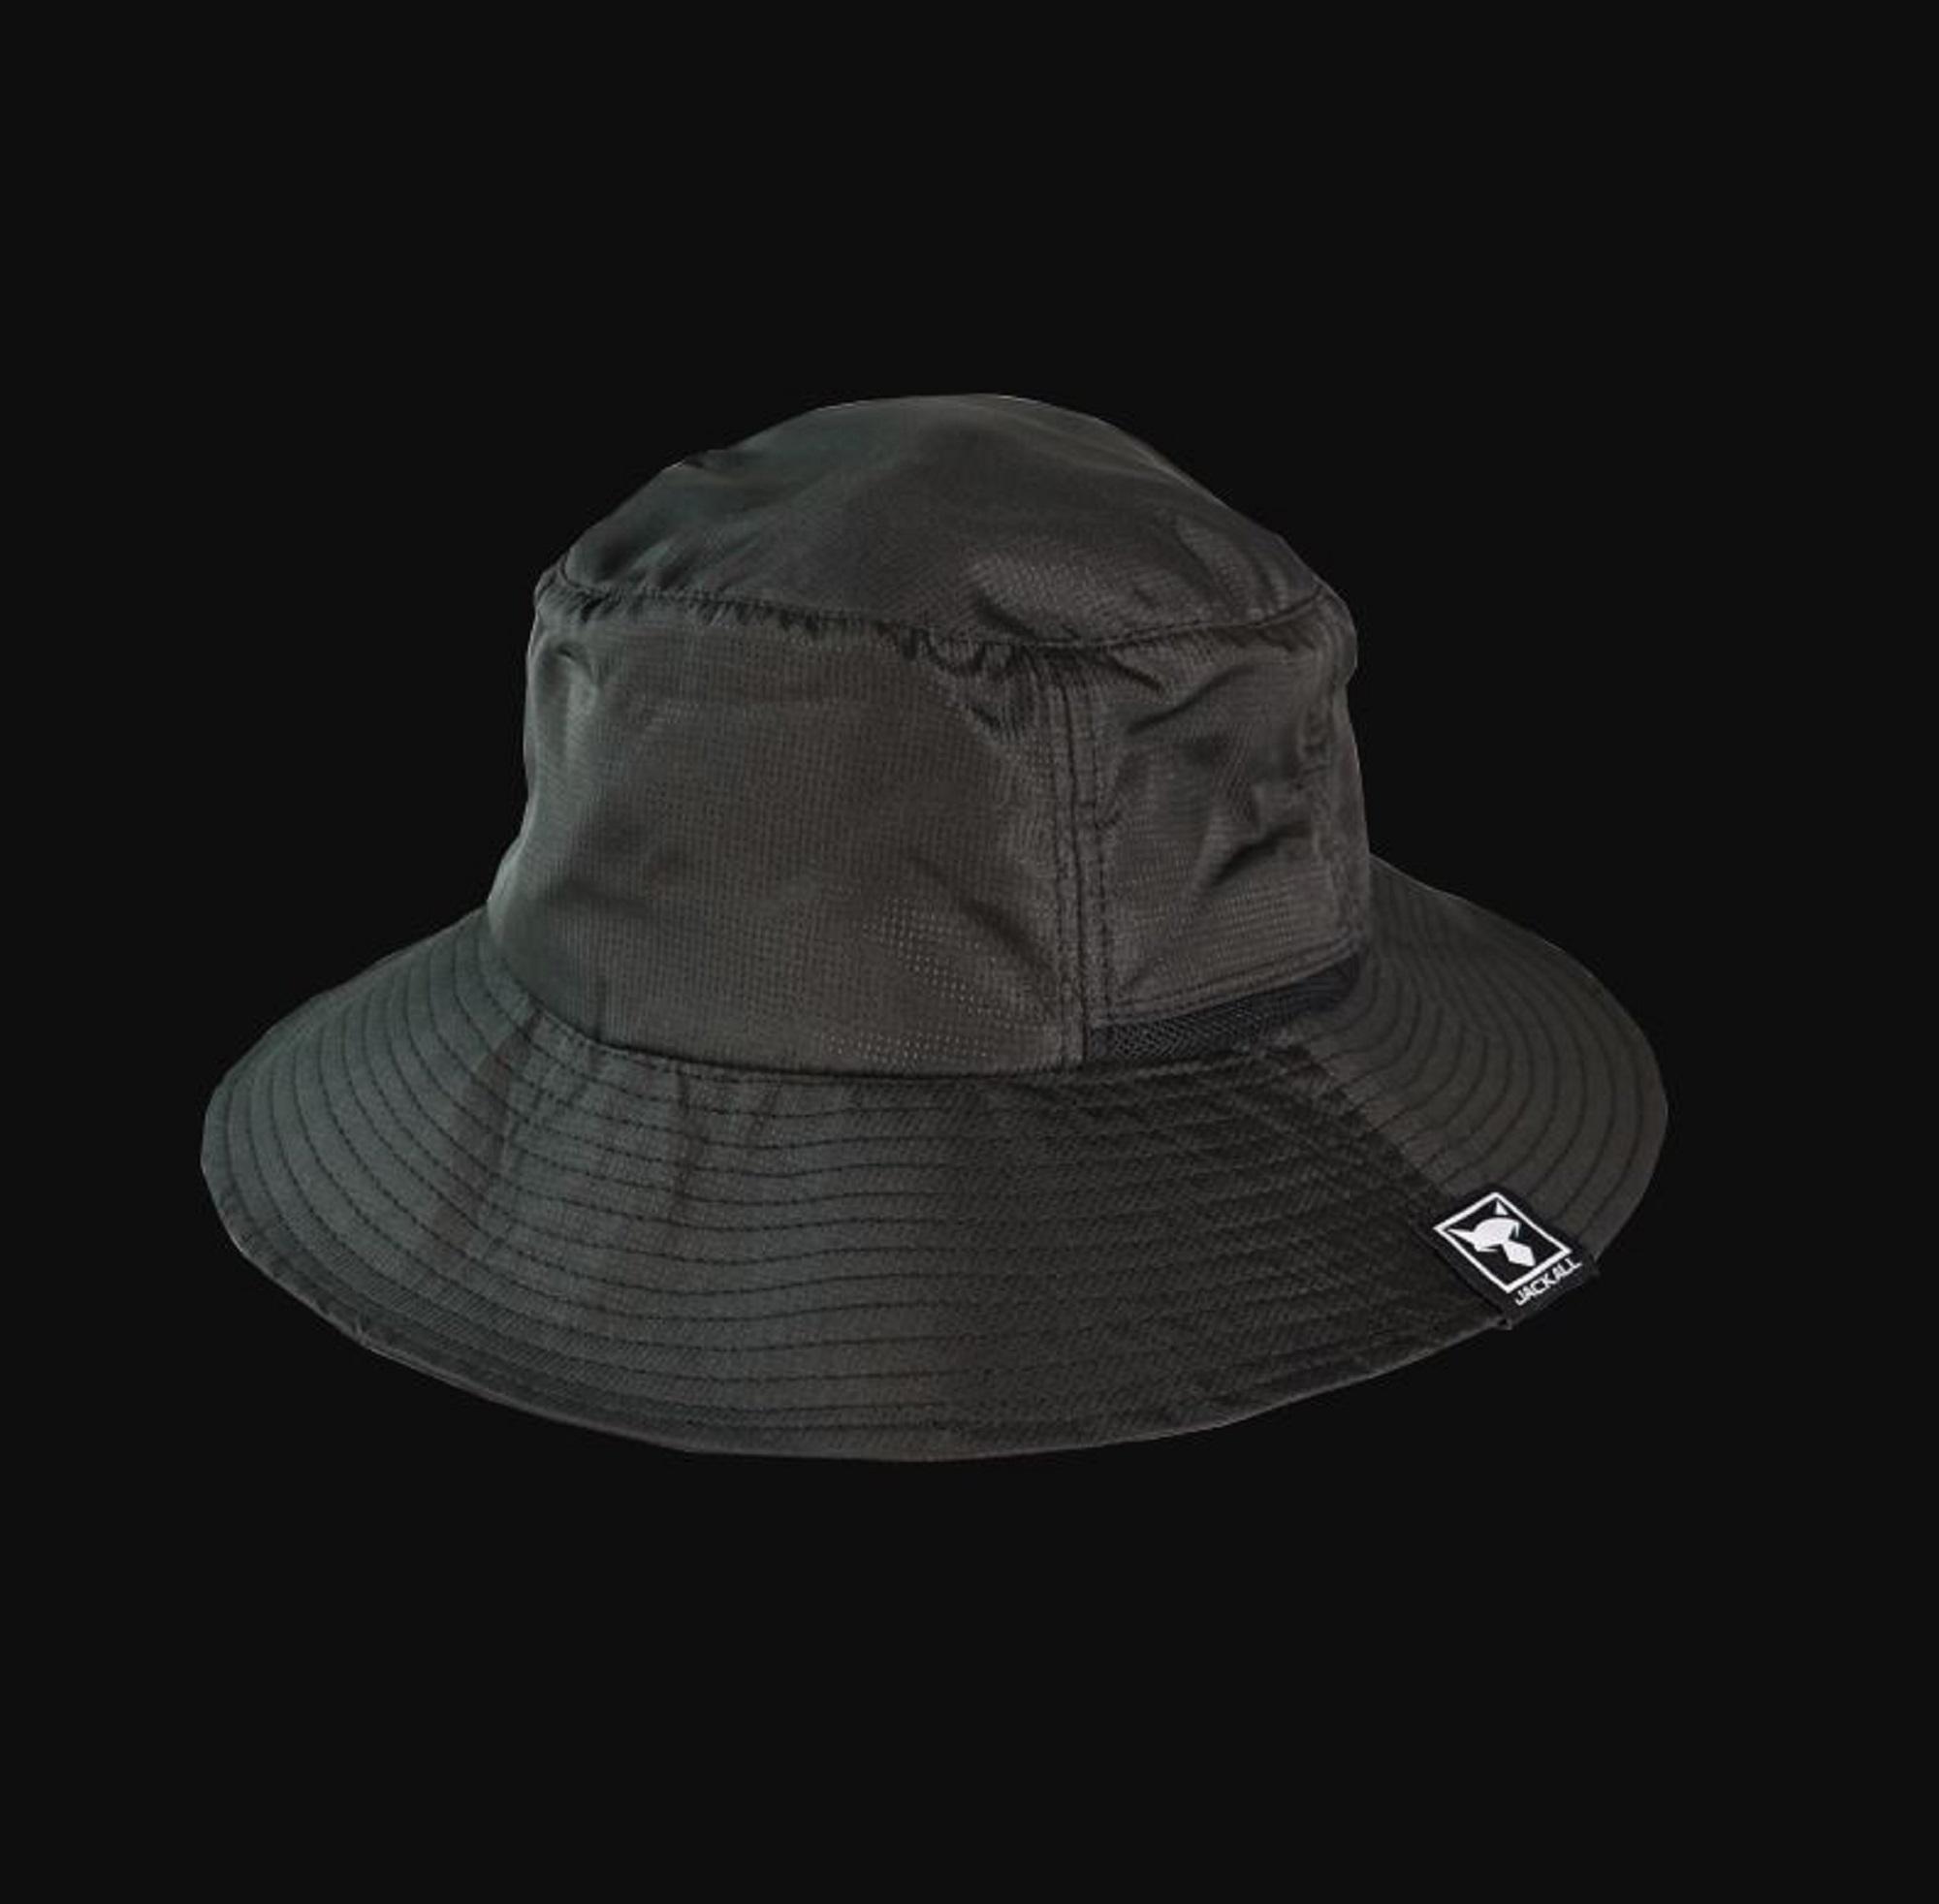 Jackall Packable Hat Original Merchandise Black (7112)